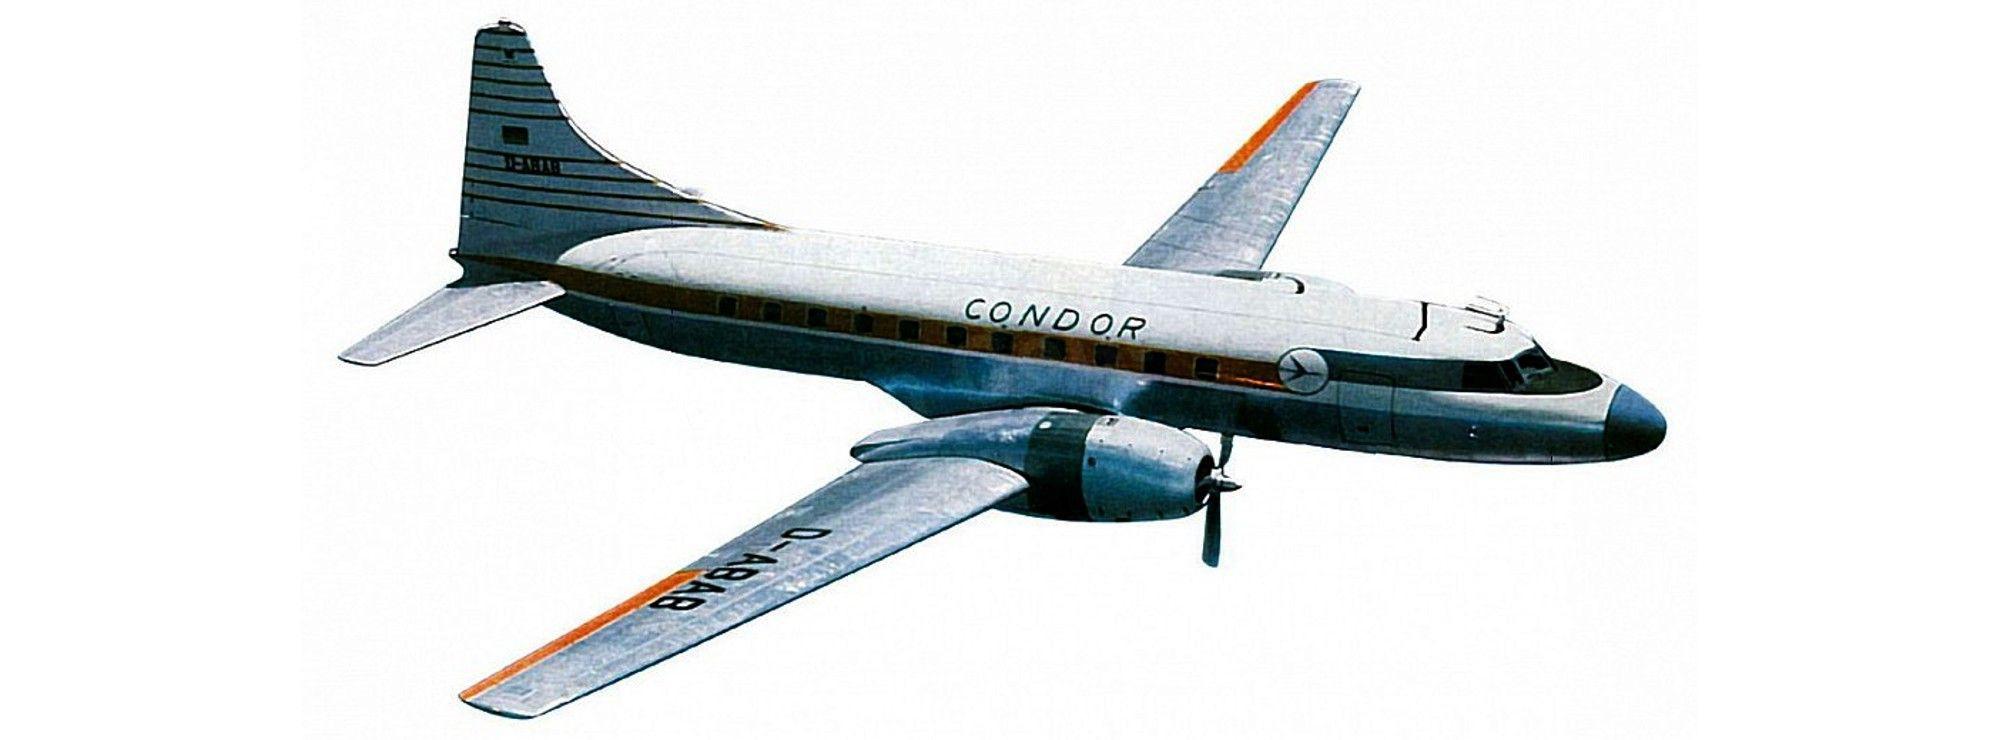 Herpa Wings 523196 Condor Convair CV-440 1:500